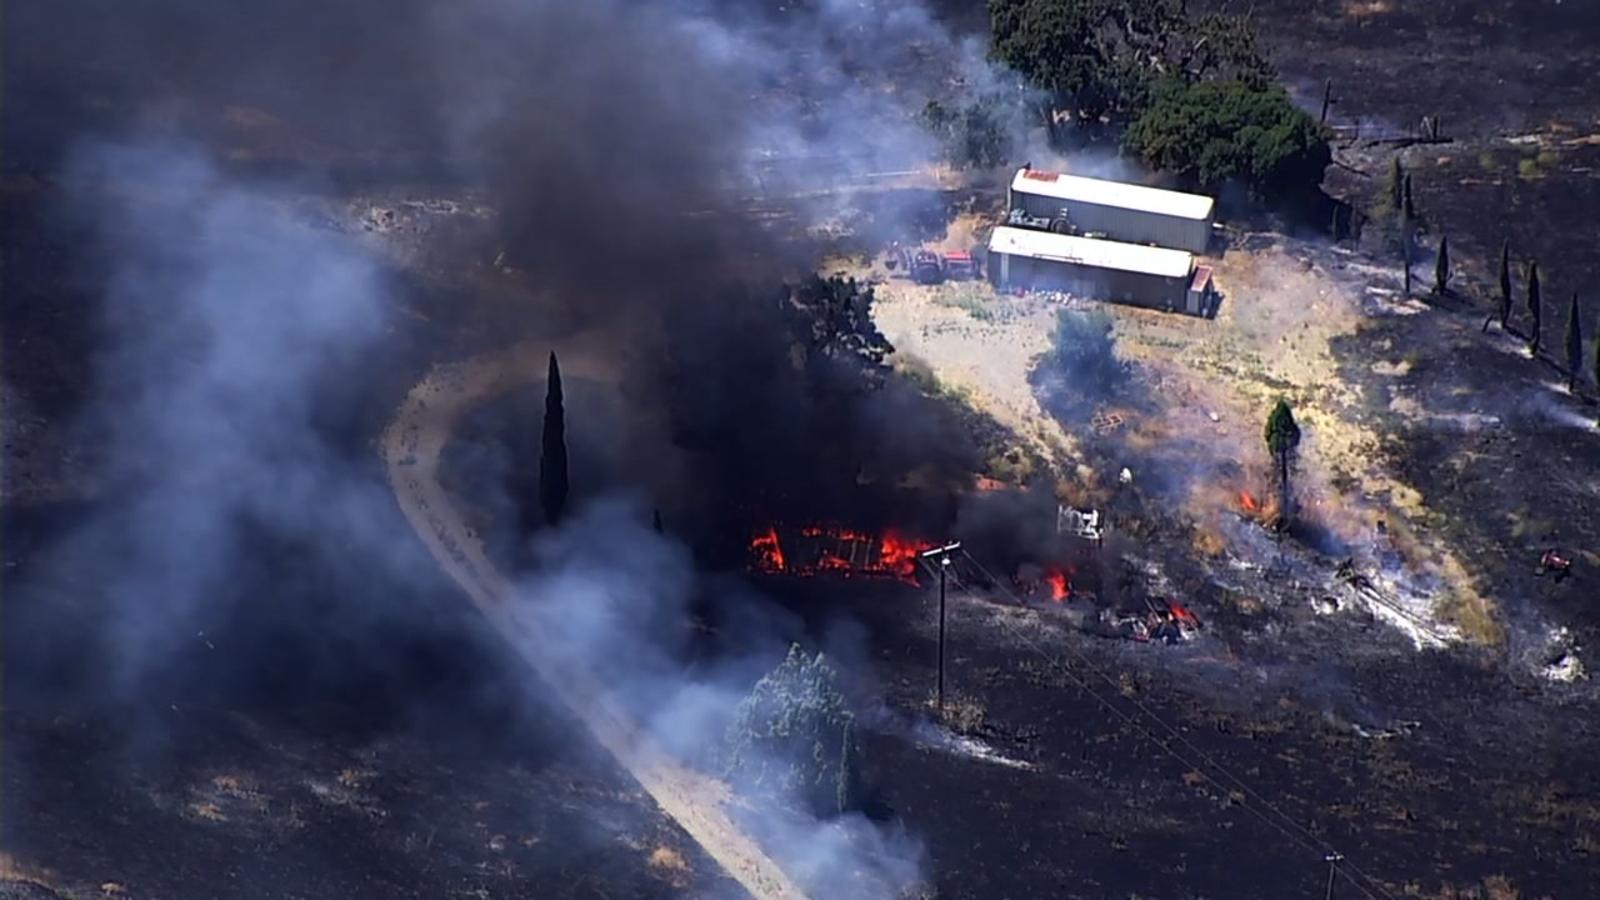 San Jose brush fire burns 47 acres, destroys 2 homes